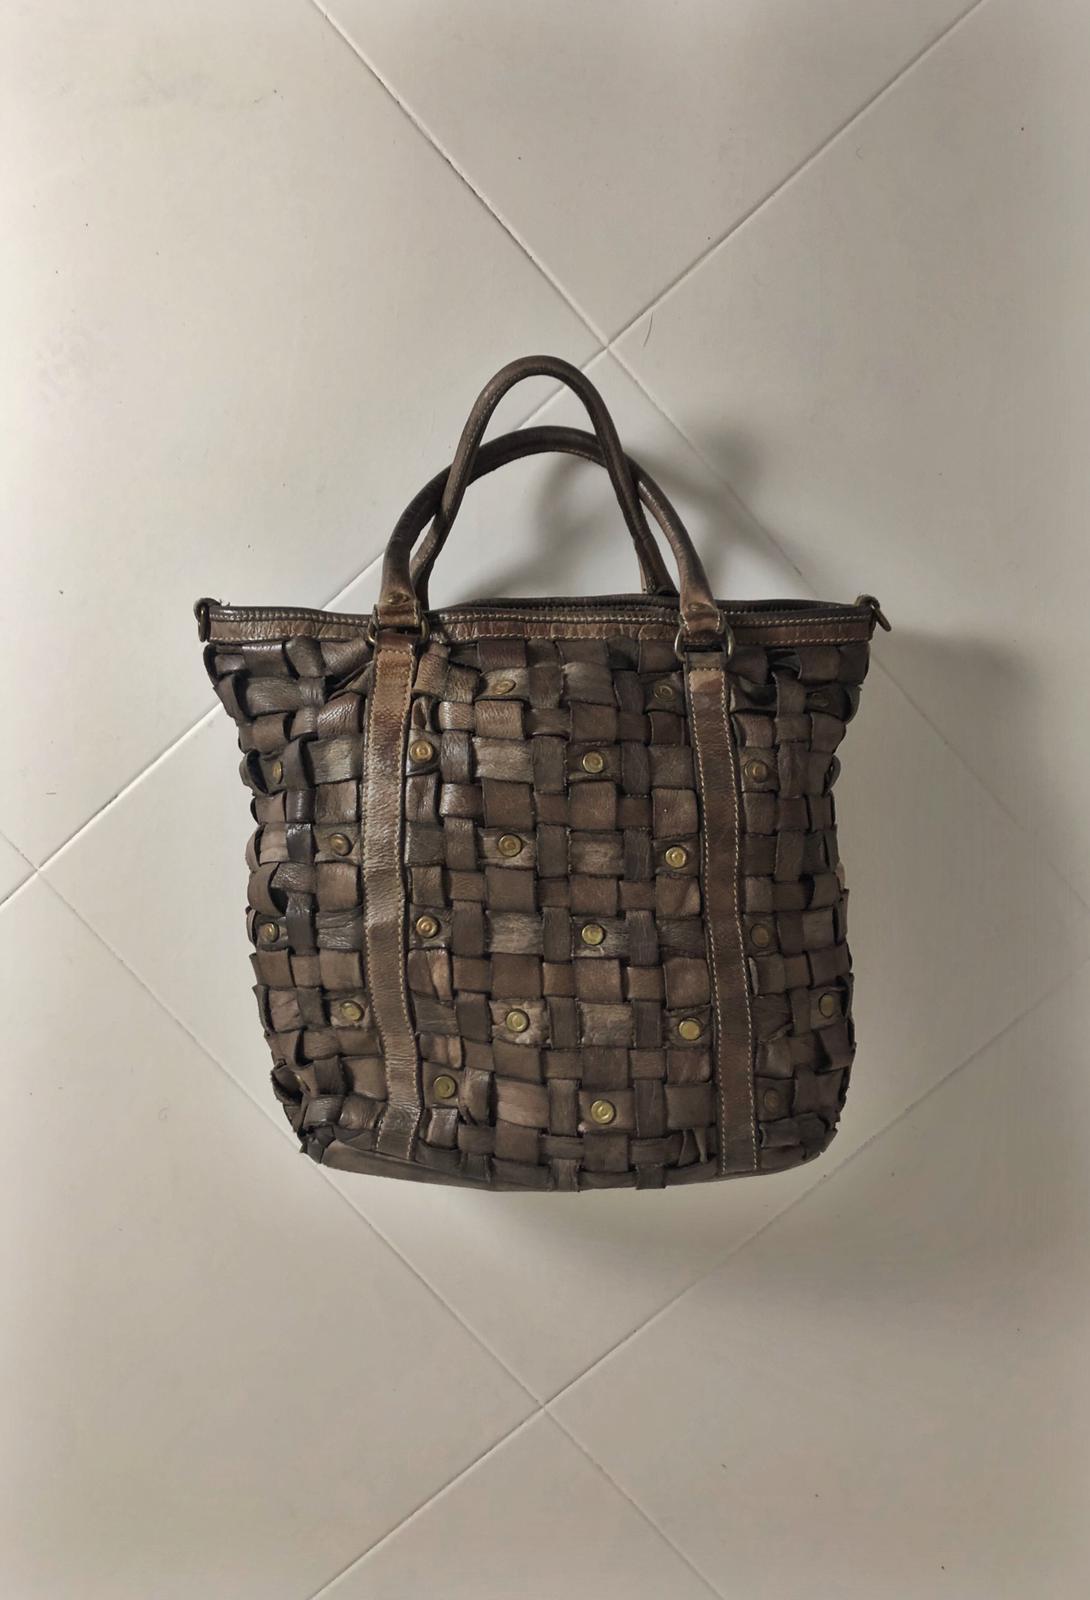 Intreccio 101 handmade woven leather bag  image 2